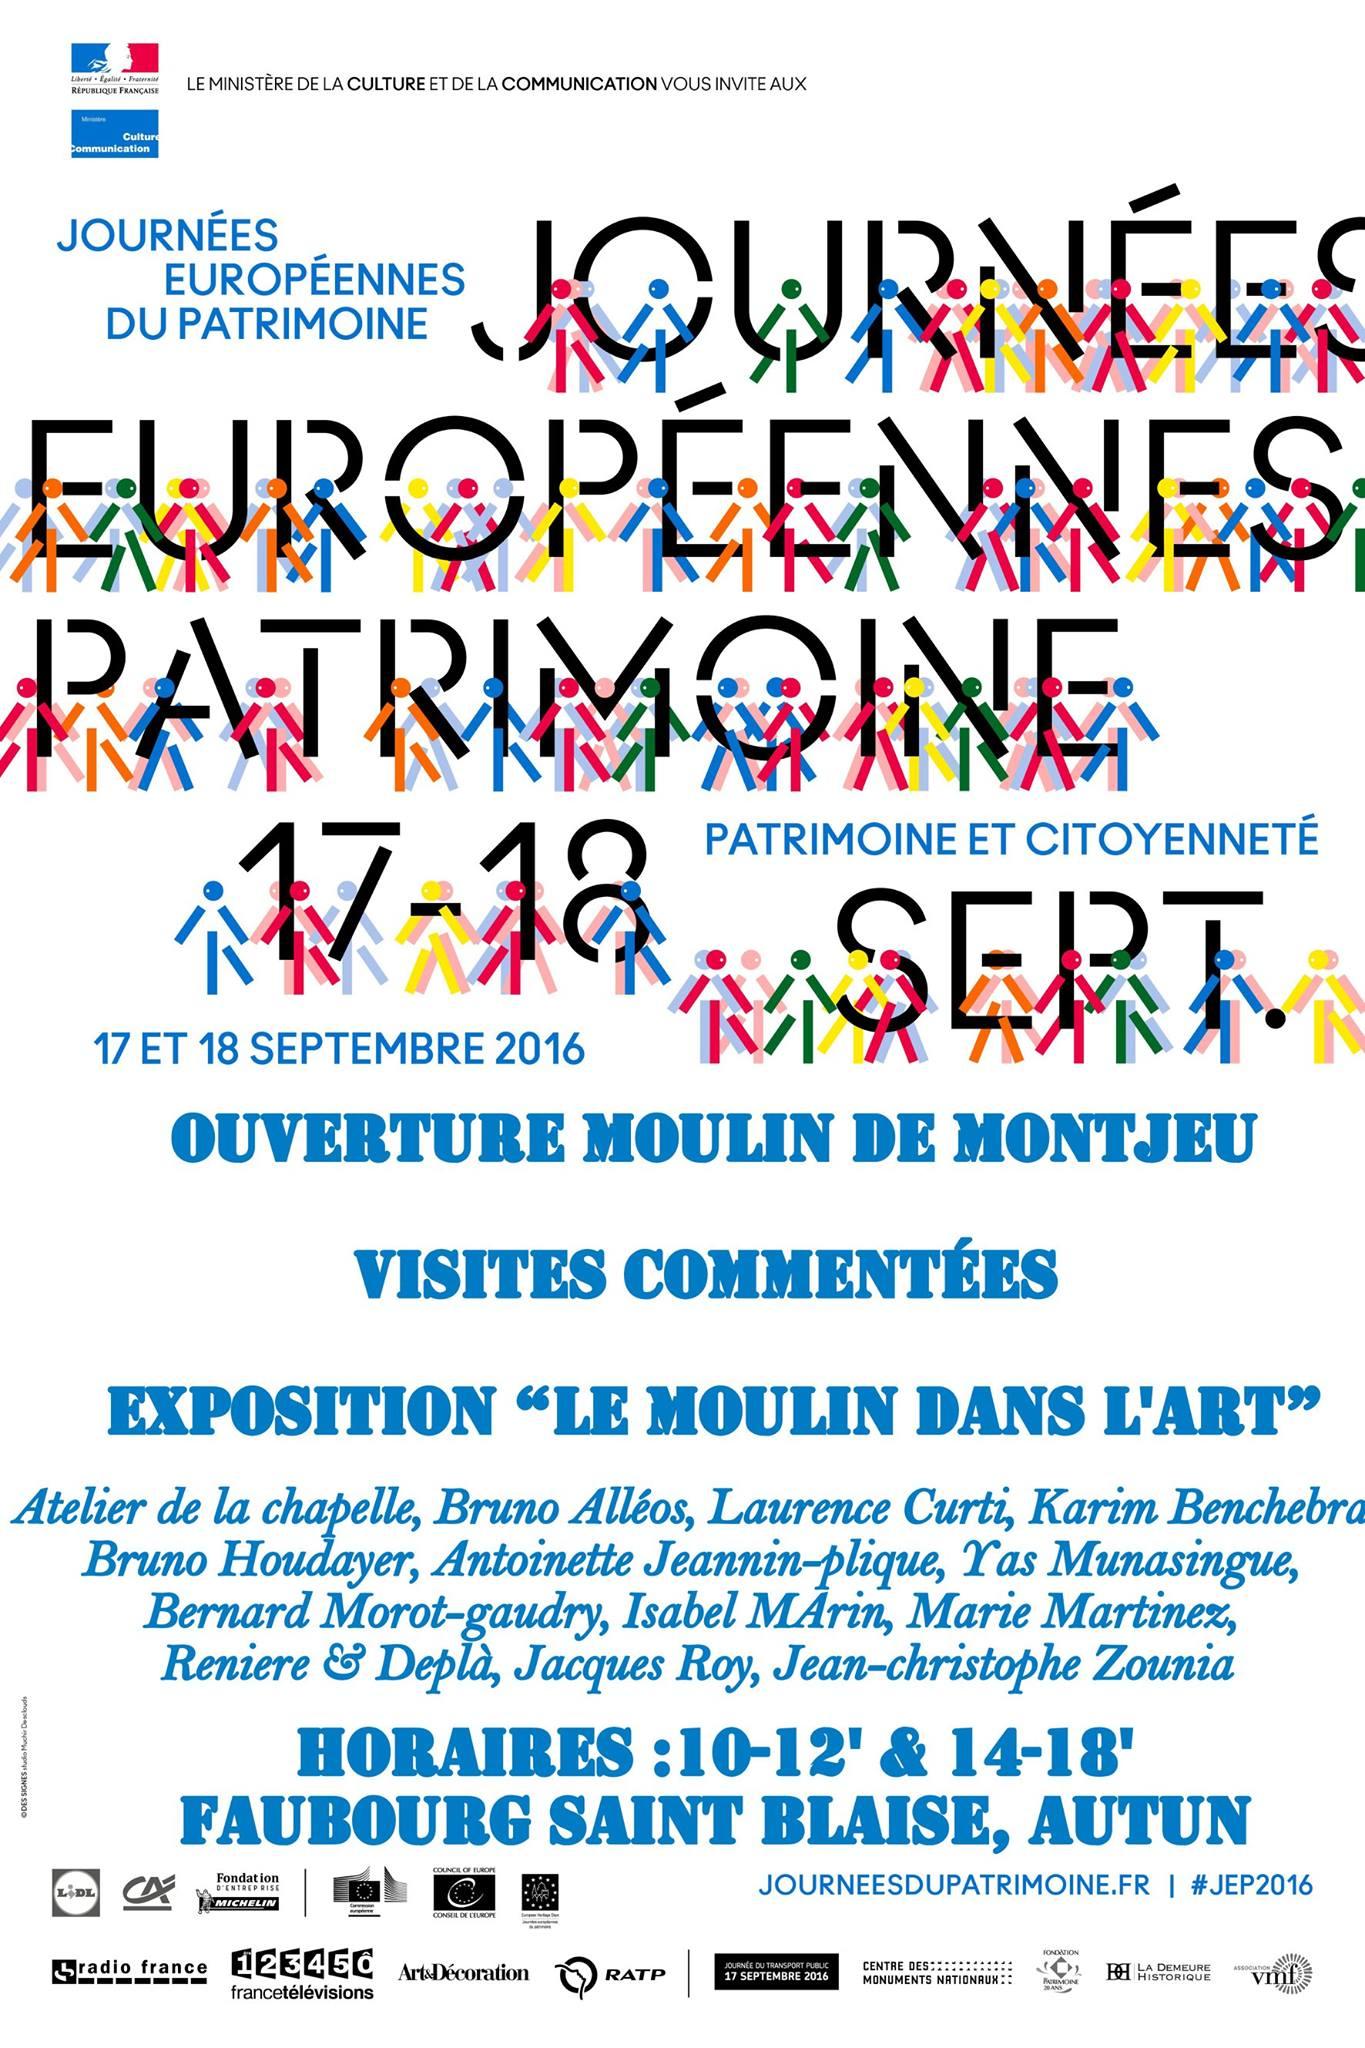 journees-europ-patrimoine